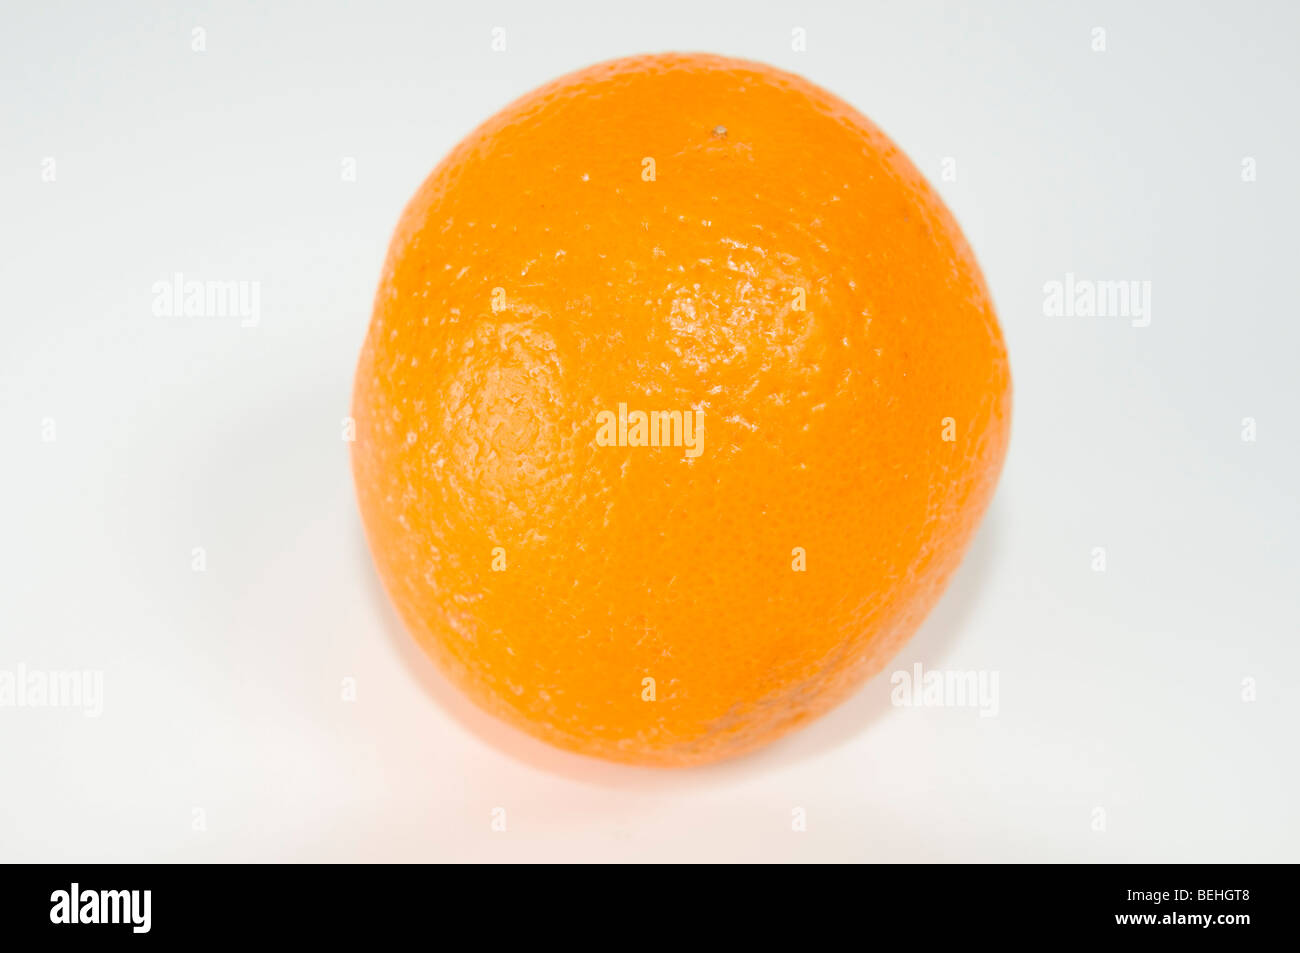 Cutout of an Orange on white background - Stock Image